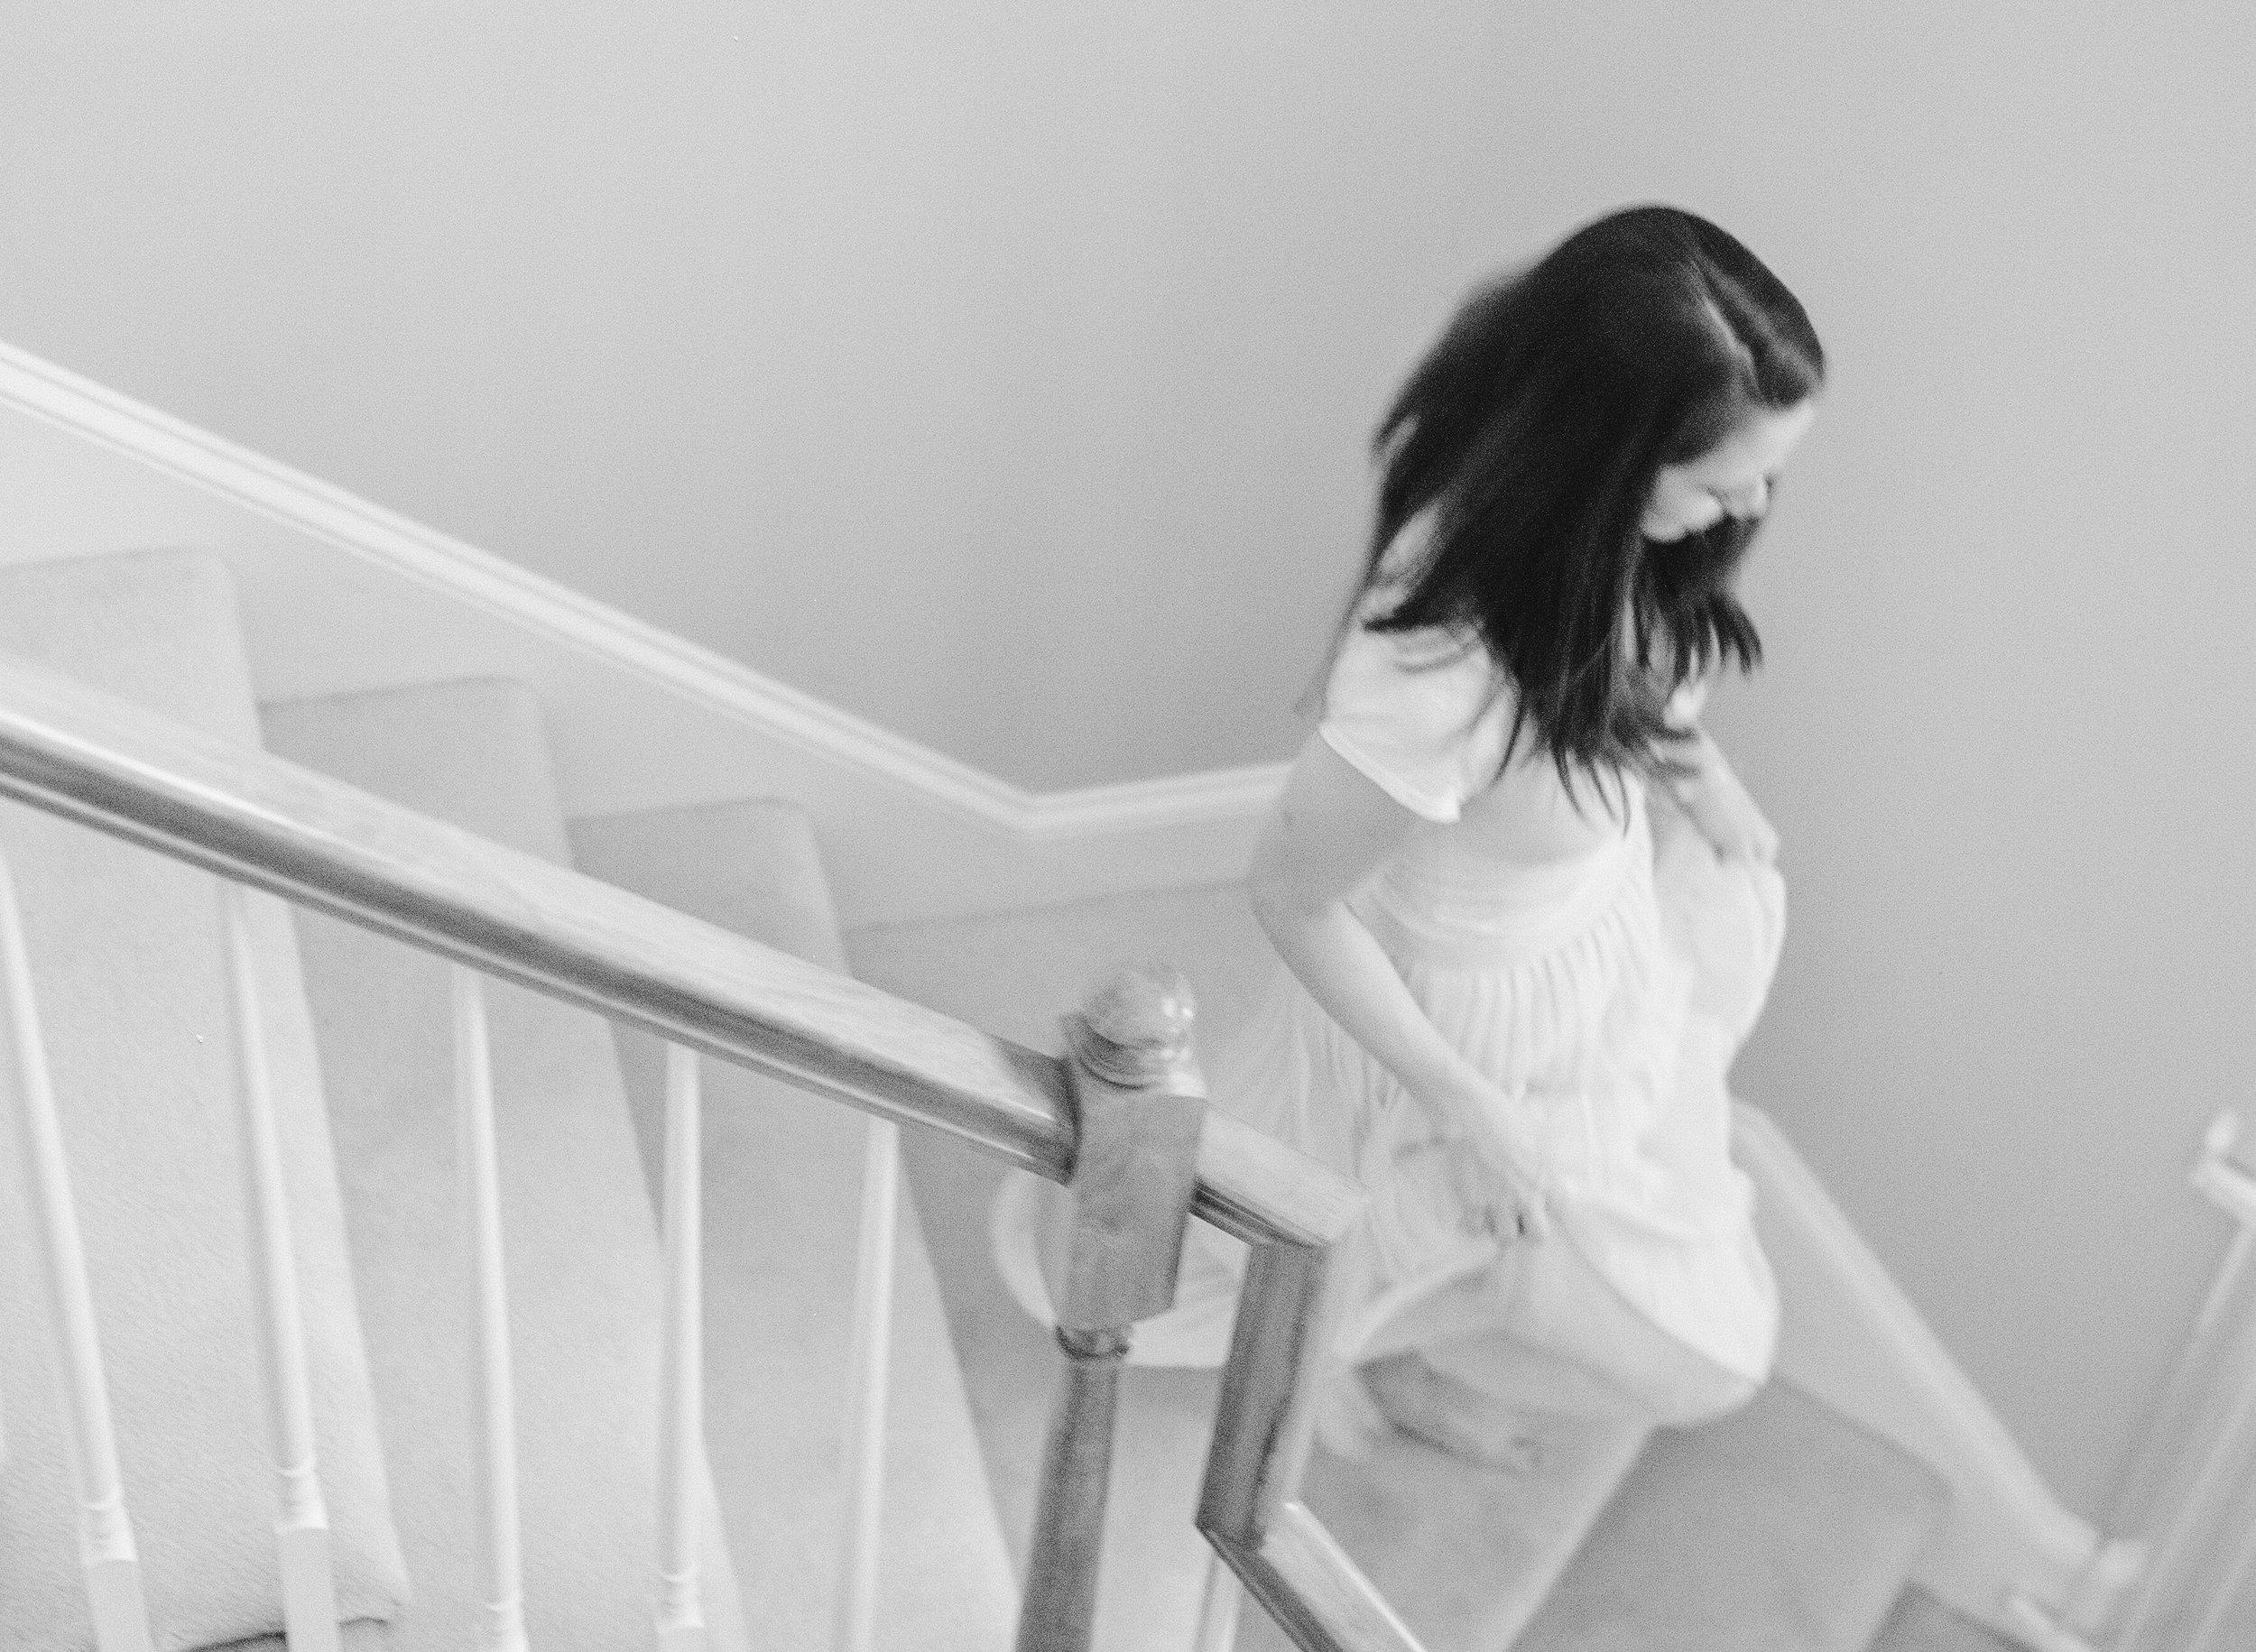 stephanie-bryan-photography-raleigh-film-photographer-motherhood-family-baby-milestone-pictures